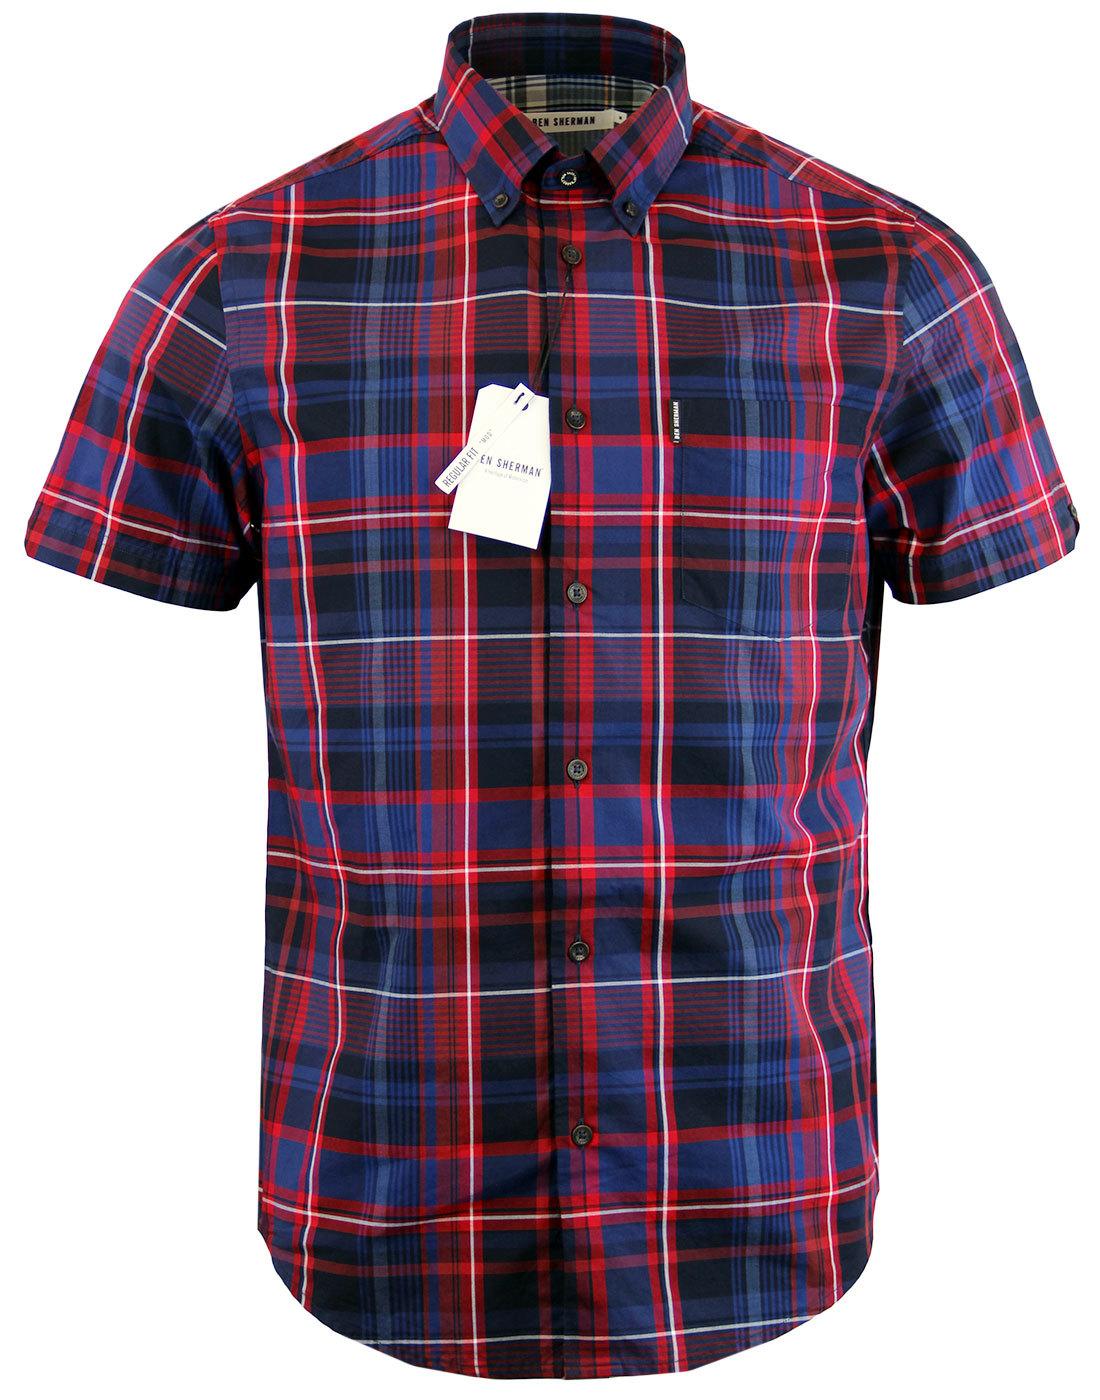 Ben Sherman Retro Mod Short Sleeve Button Down Check Shirt